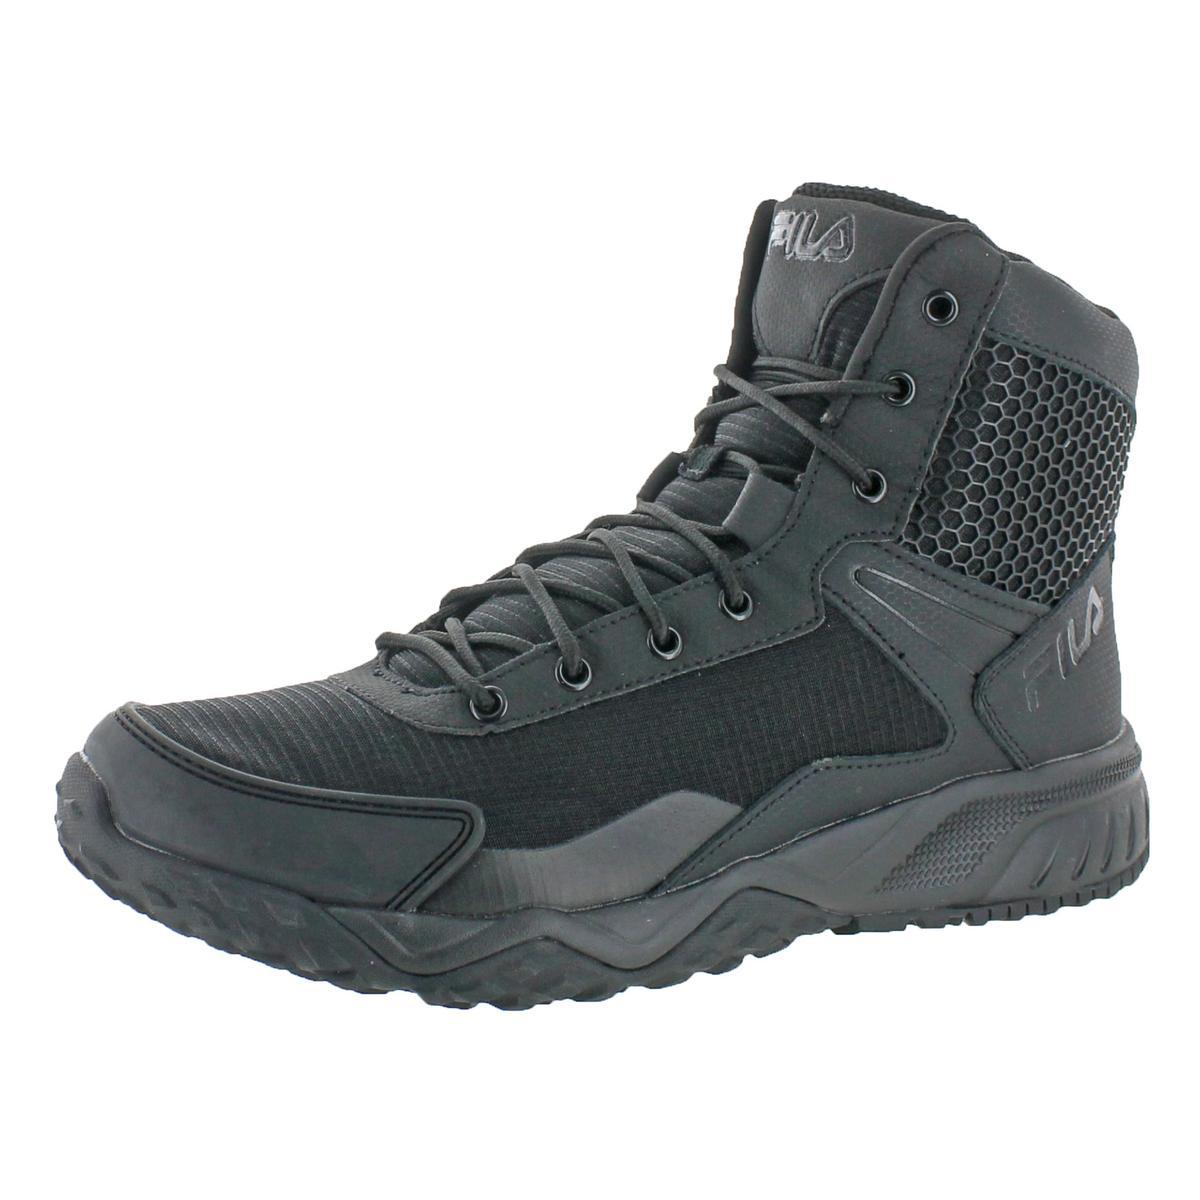 Fila Mens Stormer Black Leather Tactical Boots Shoes 11 Medium (D) BHFO 9669